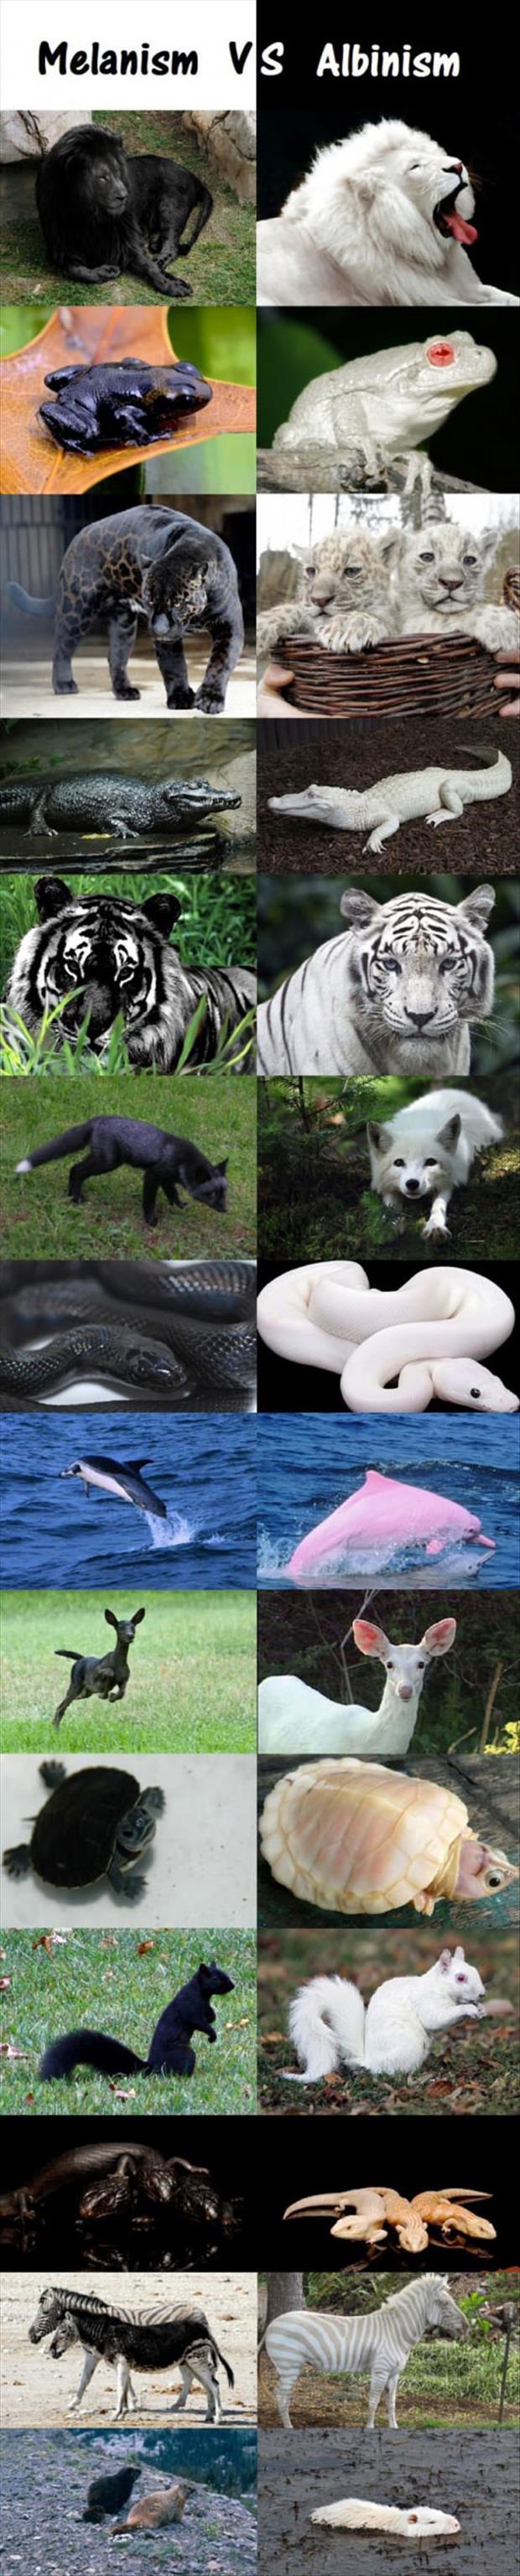 melanism-vs-albinism